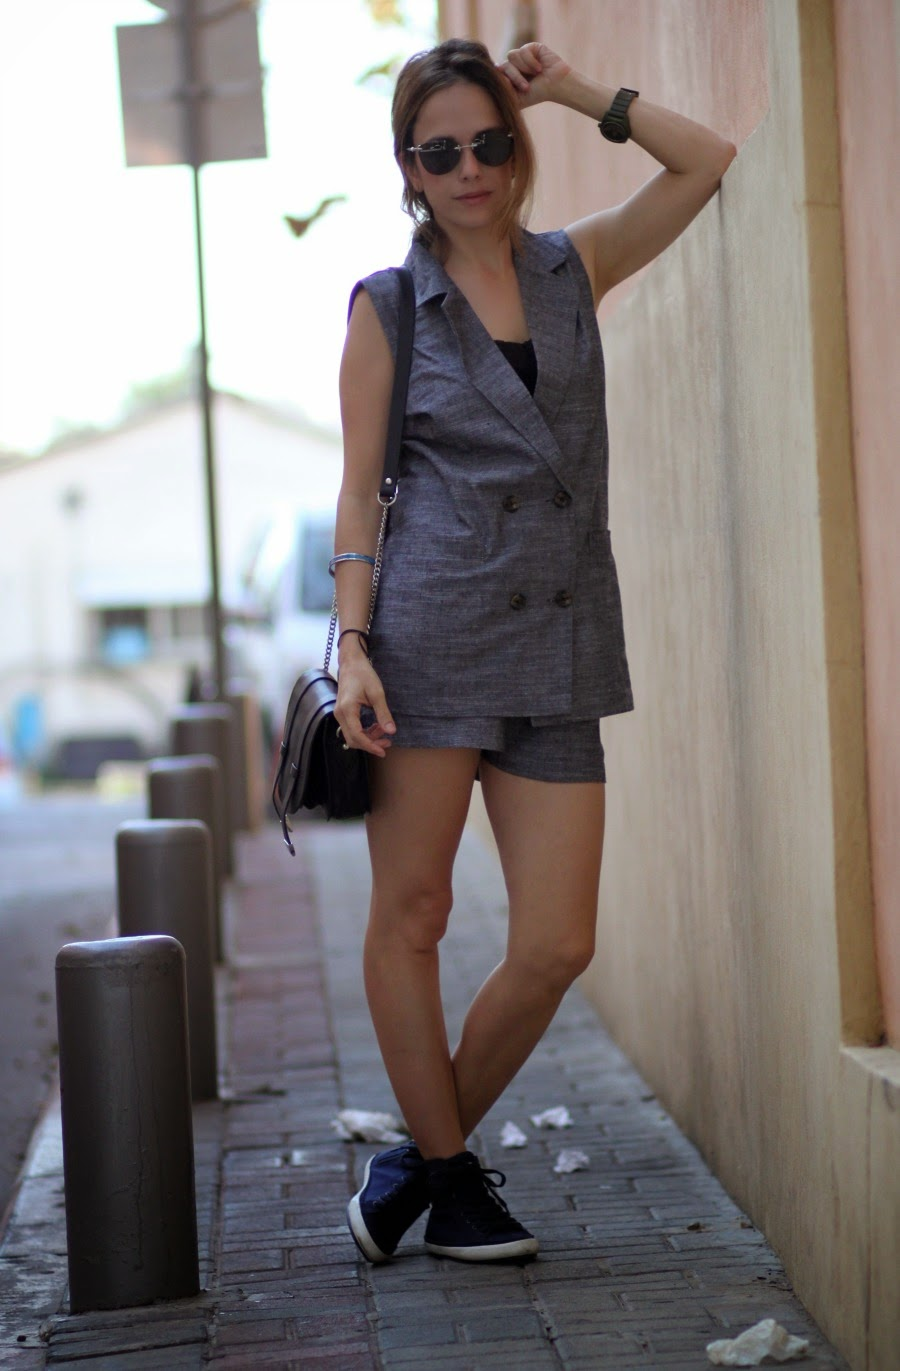 autumn/winter2015, fw15, greysleevlessjacket, planb, fashionblog, streetstyle, telavivfashion,